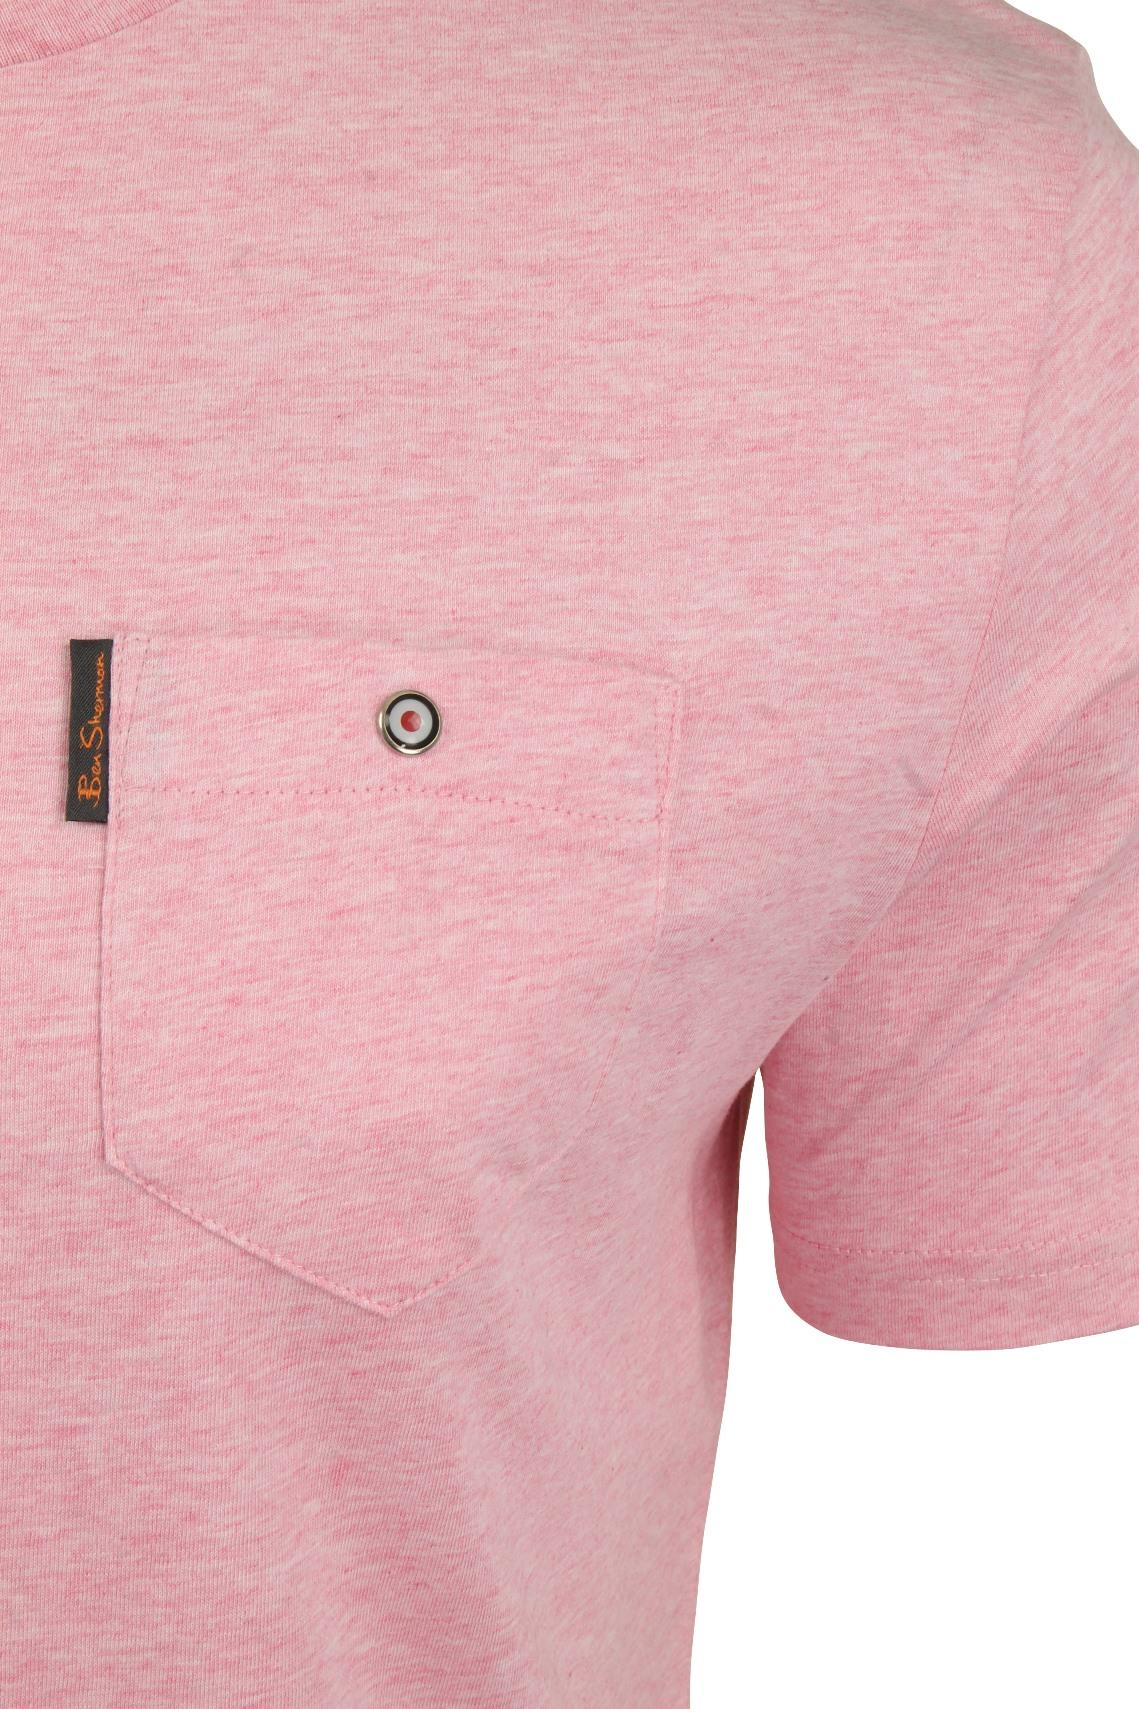 Mens-Classic-Spade-Pocket-T-Shirt-by-Ben-Sherman thumbnail 27